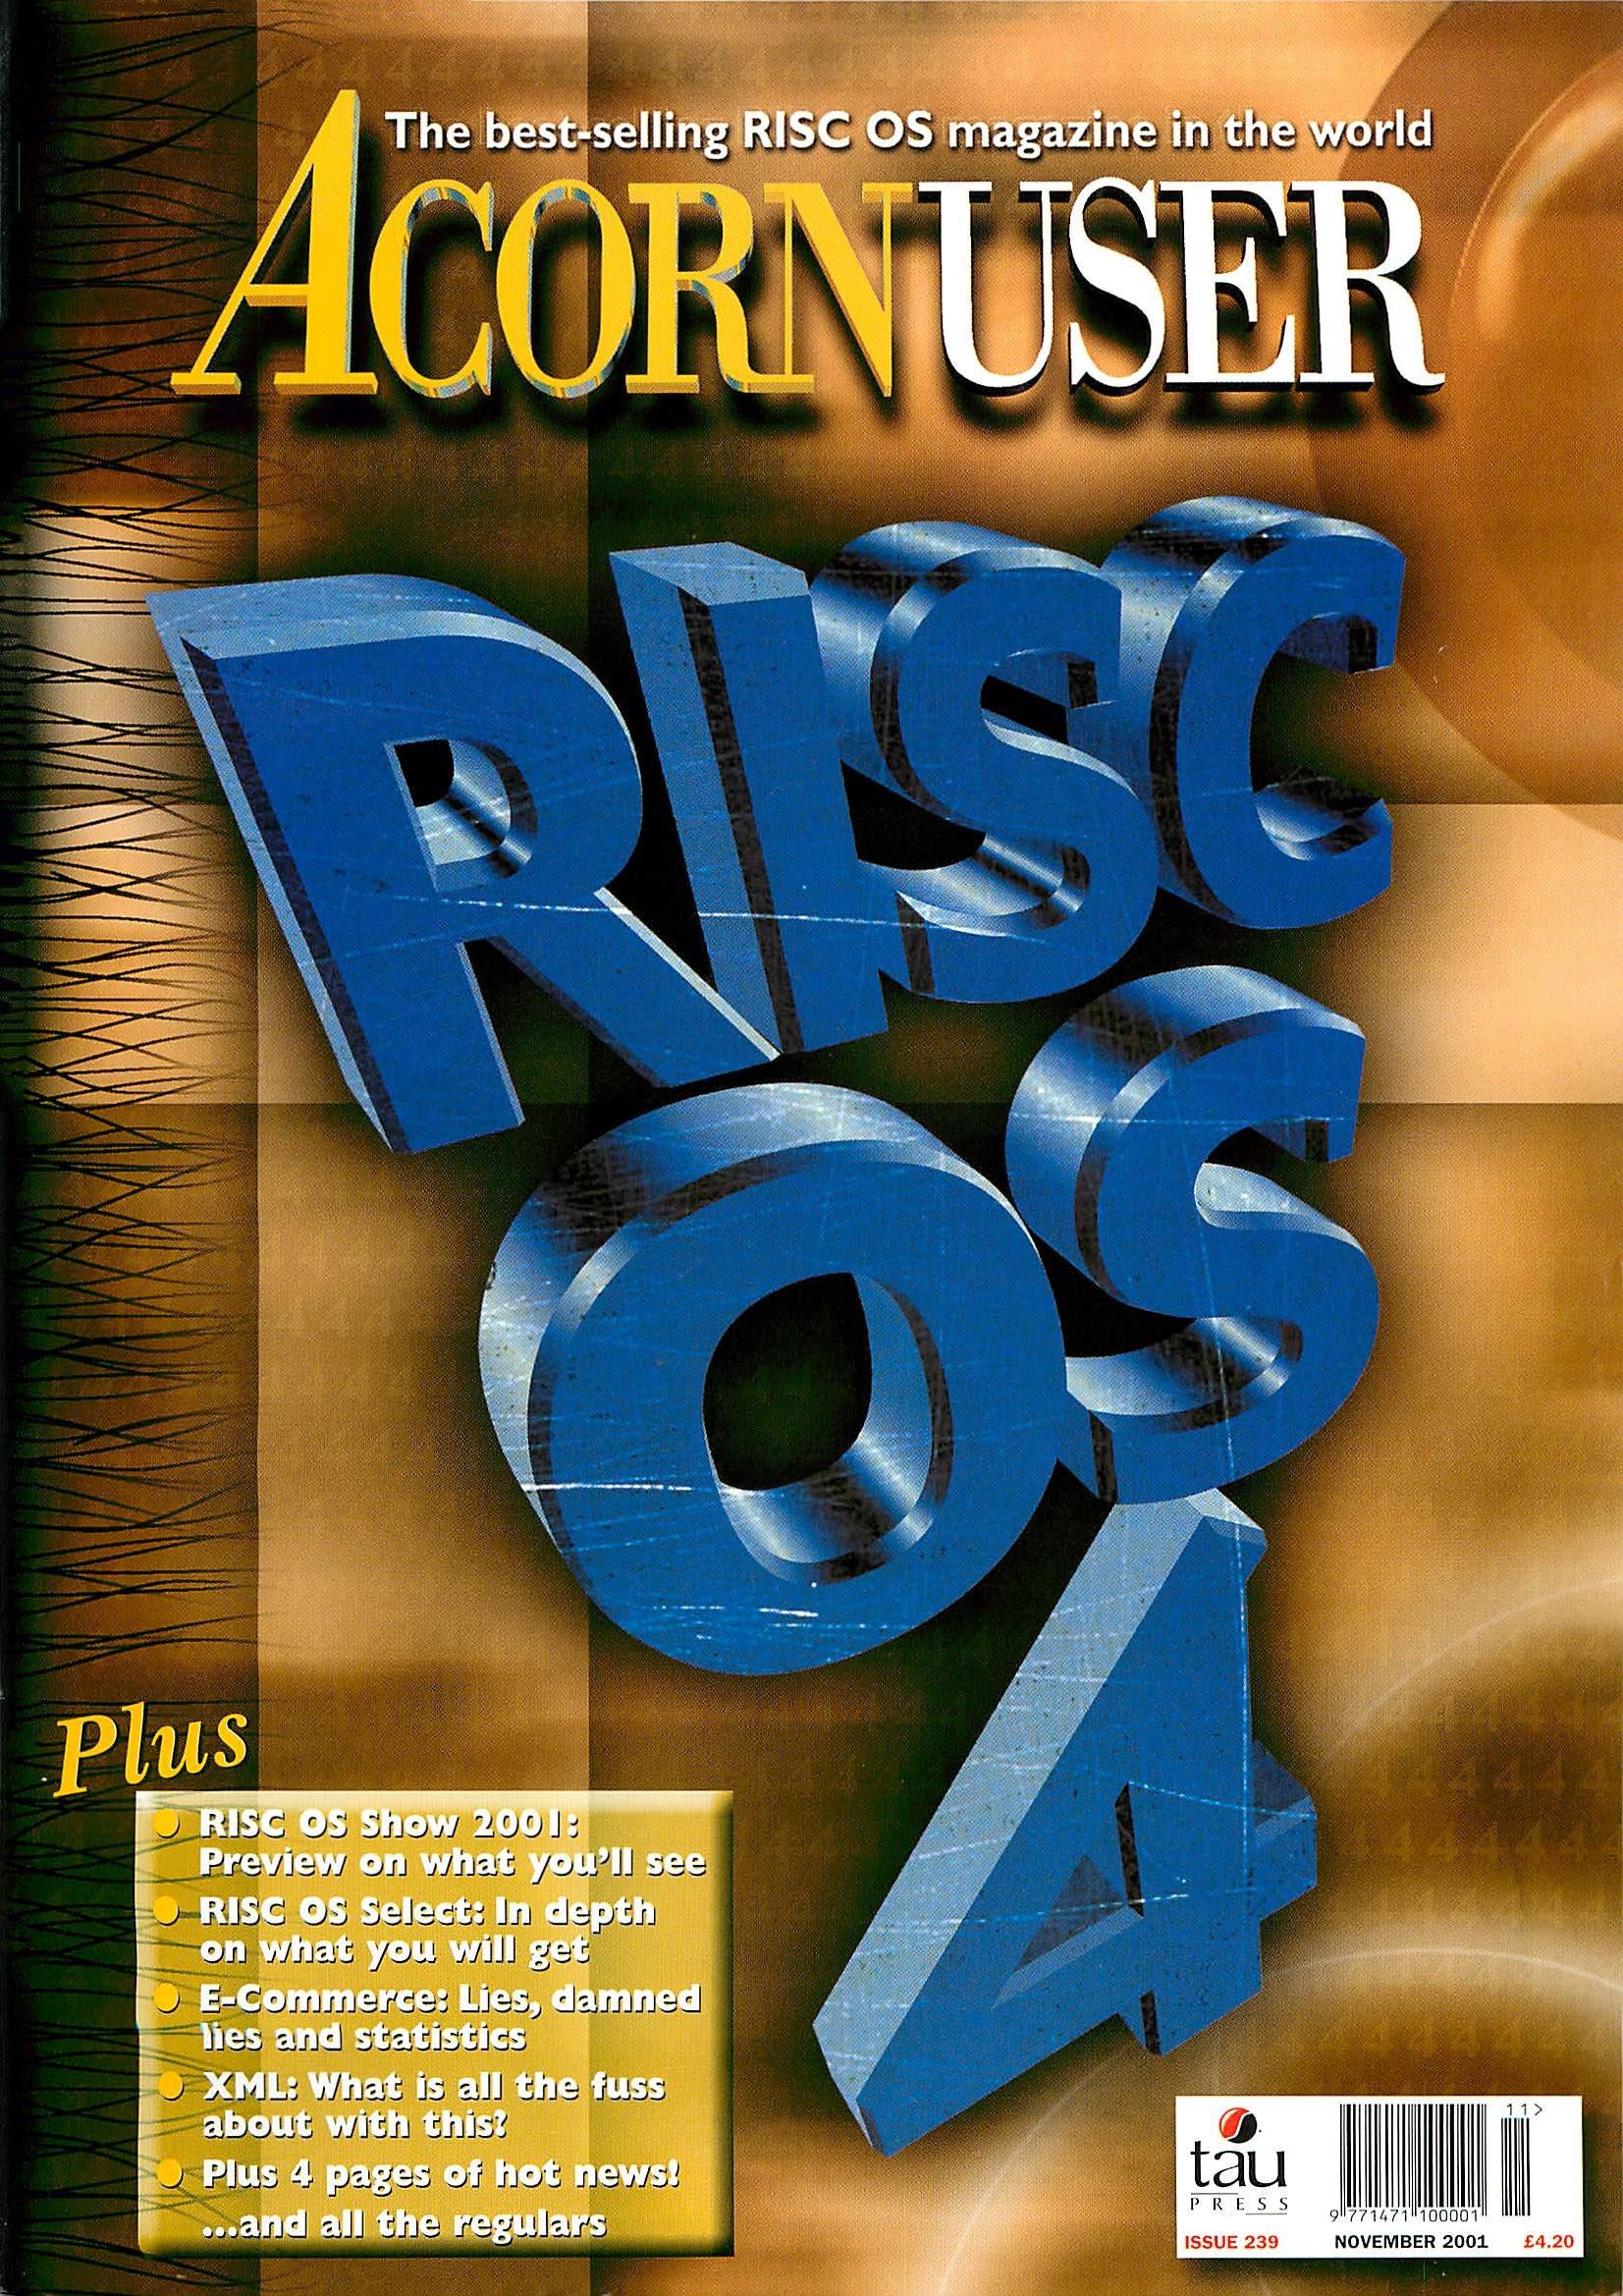 Acorn User 239 (November 2001)